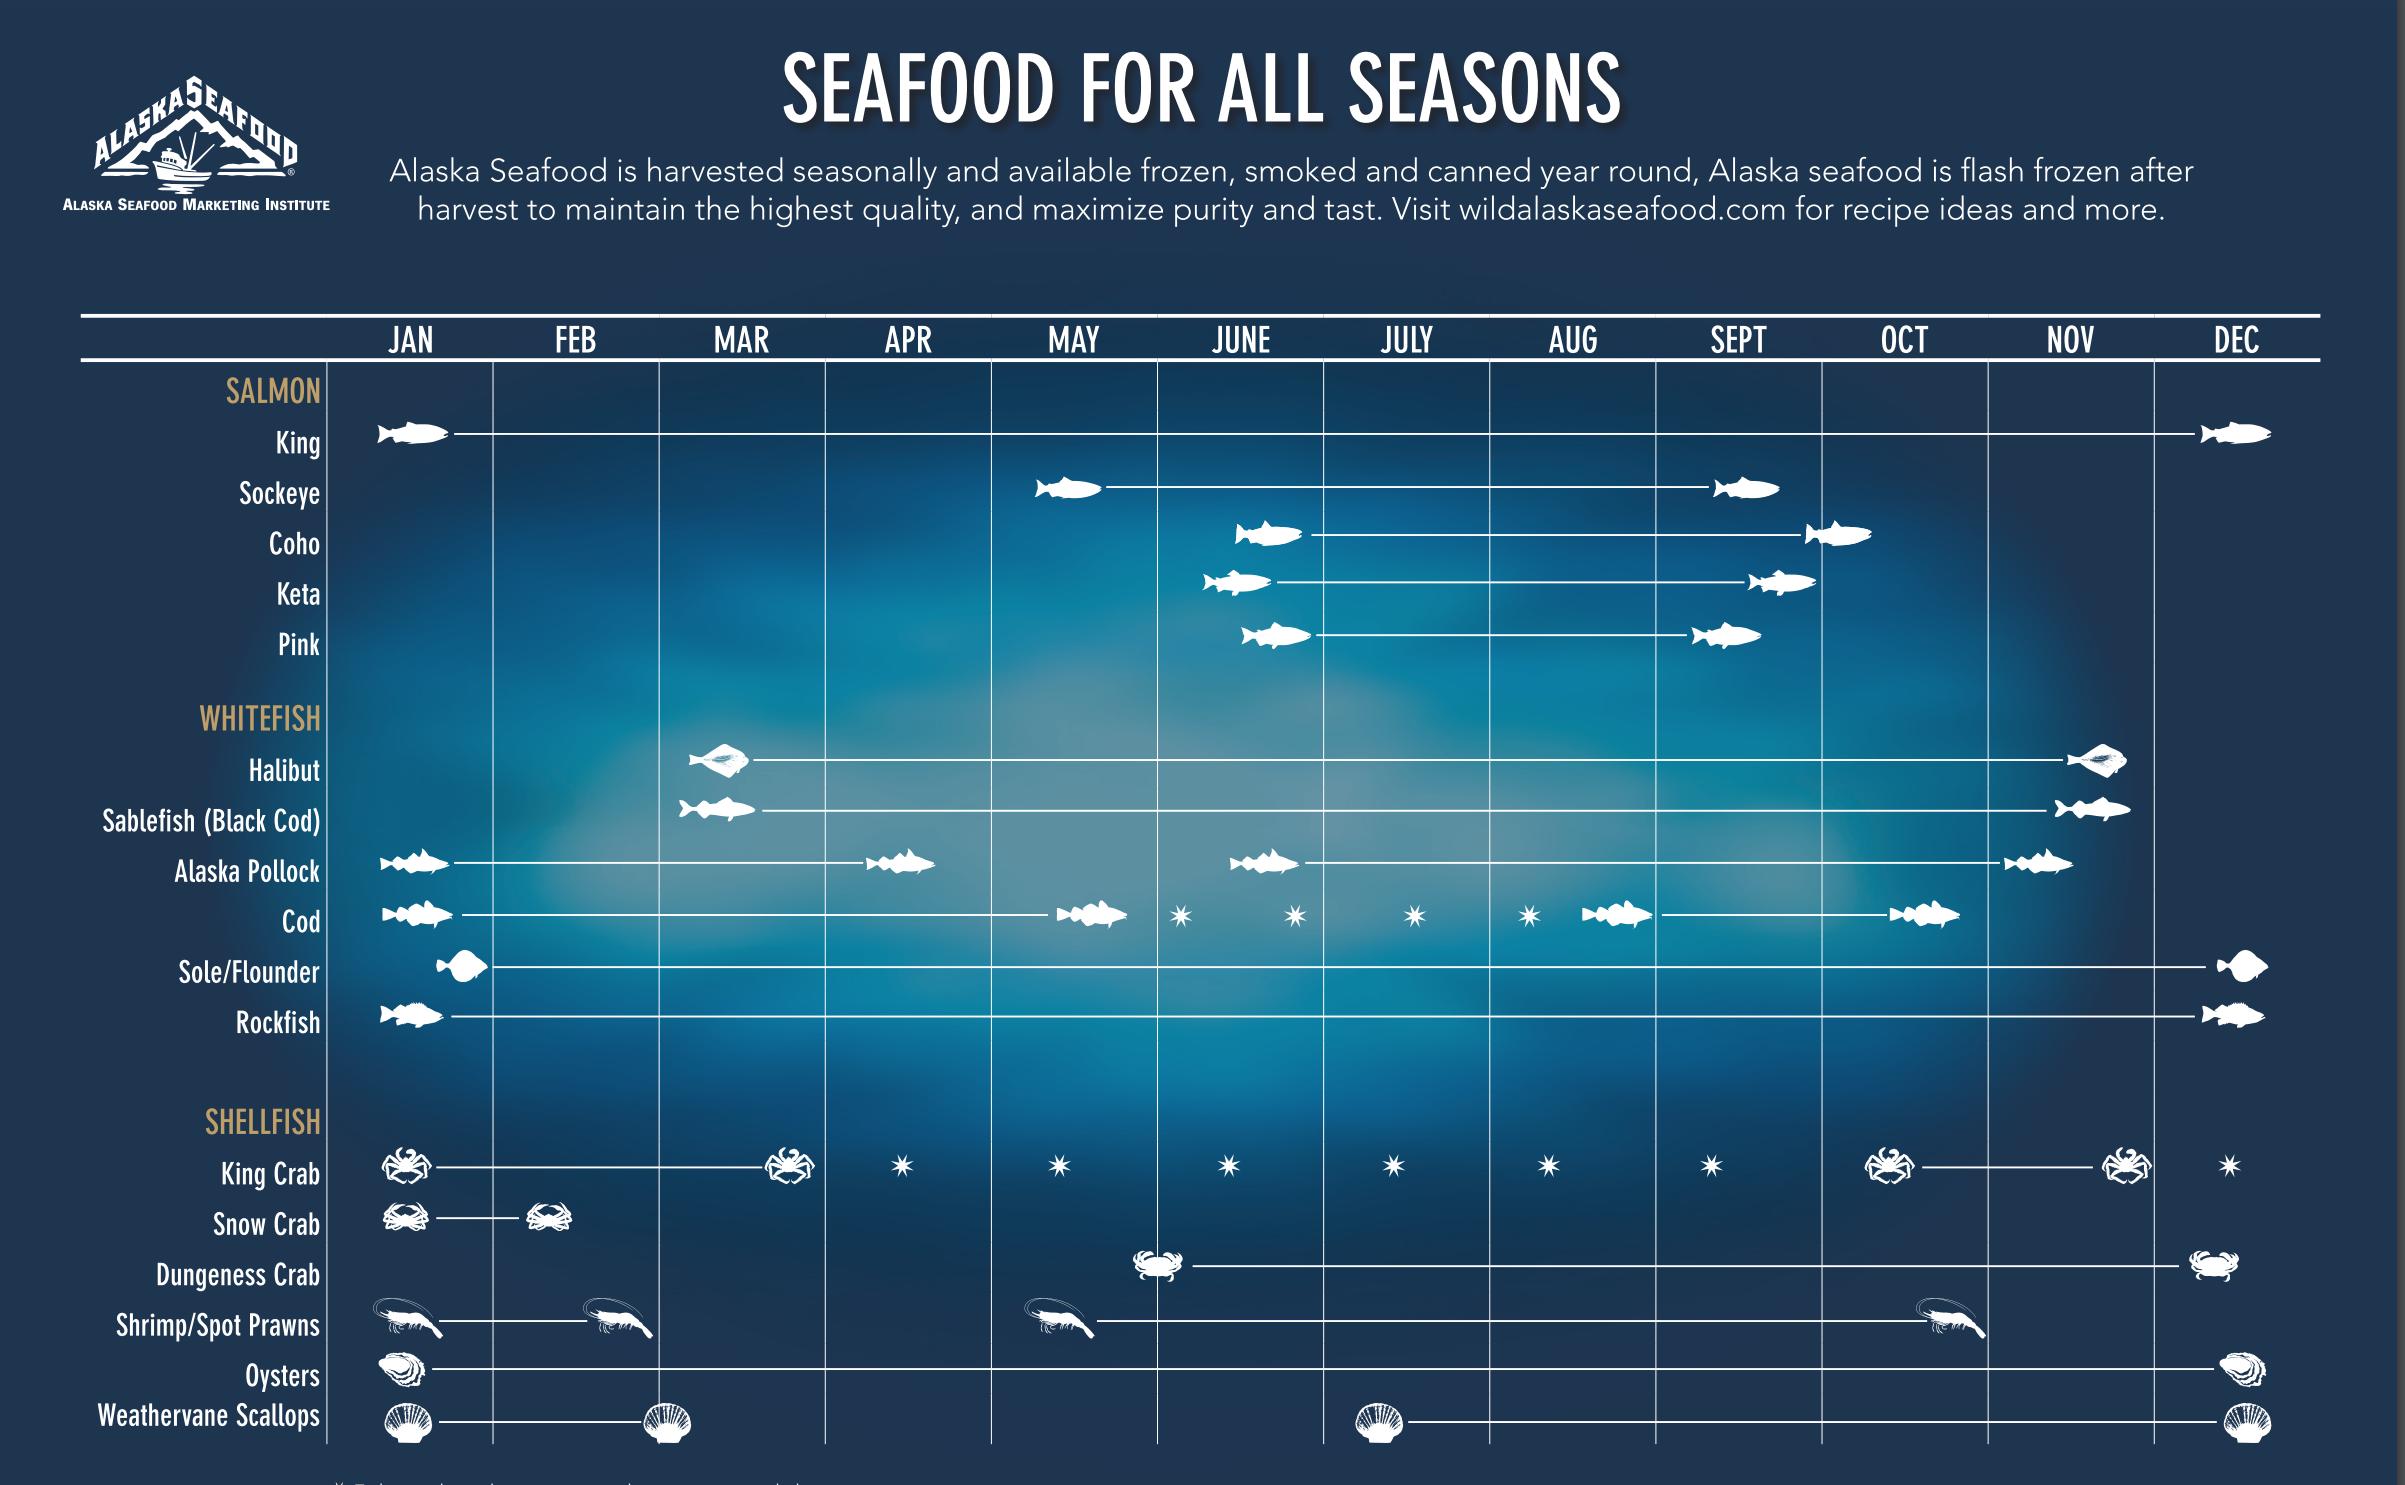 Seasons of Alaskan Seafood